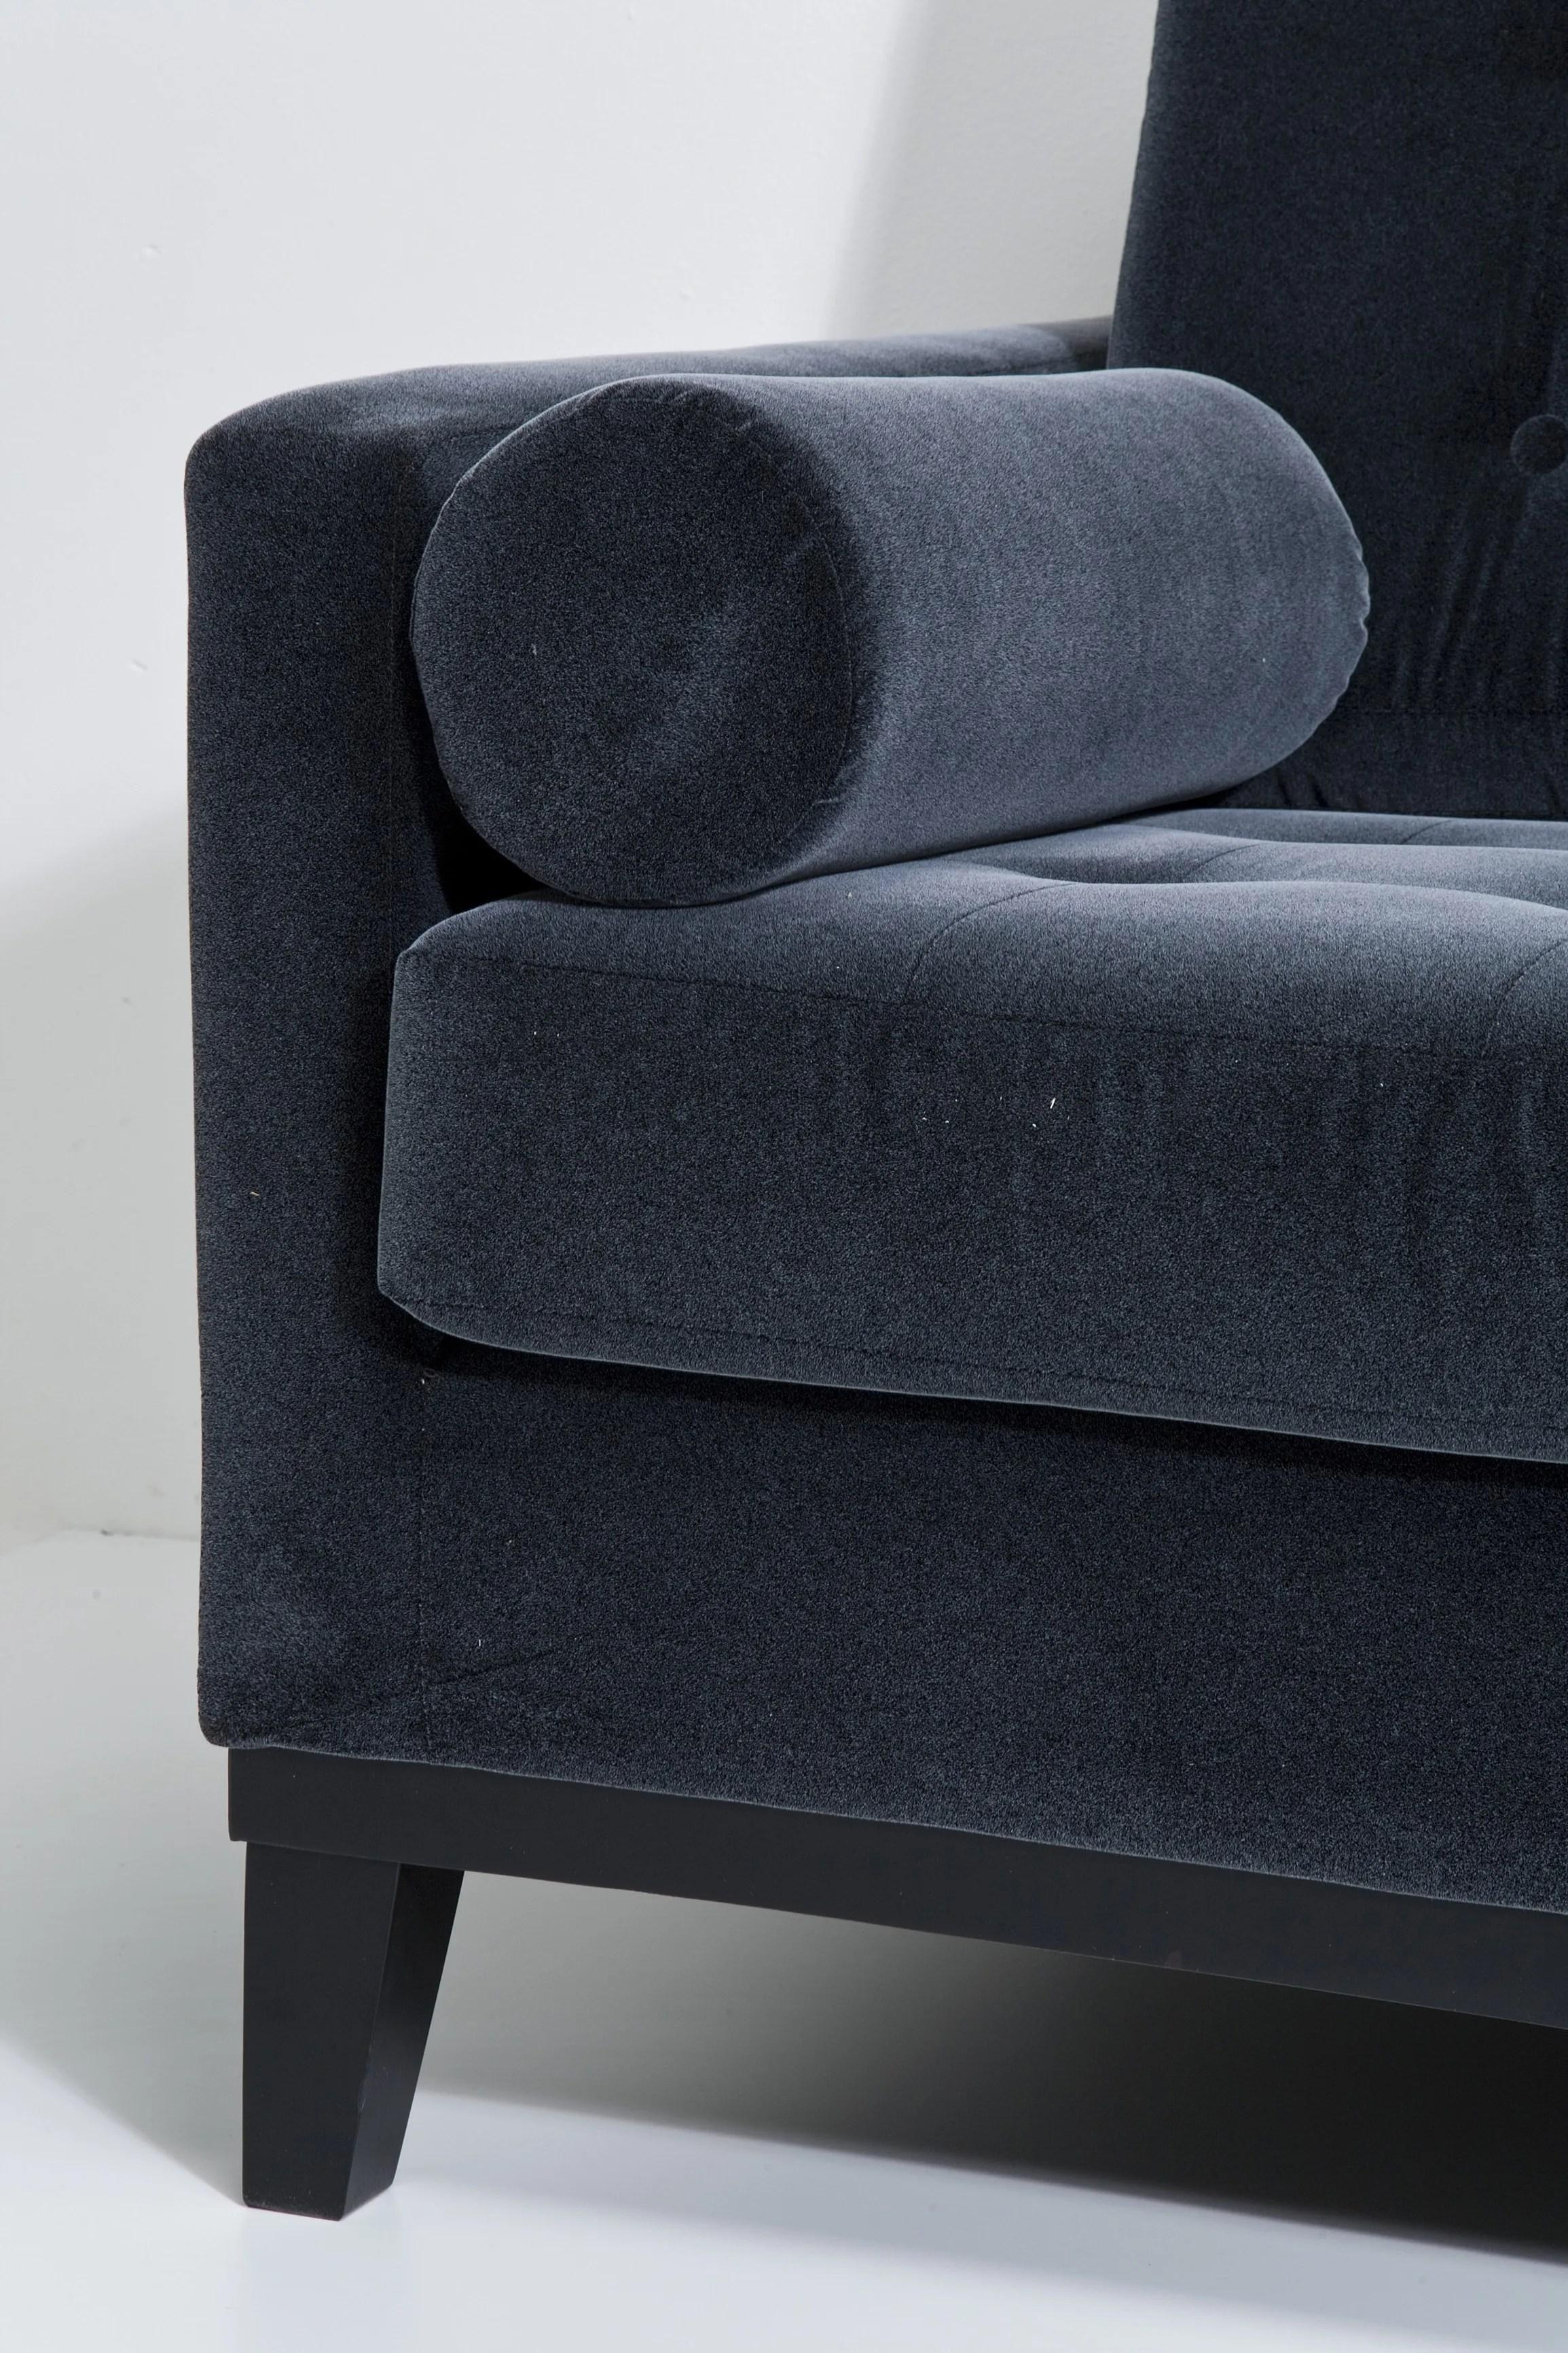 3 seater fabric sofa grey furniture made in usa casino dark by kare design